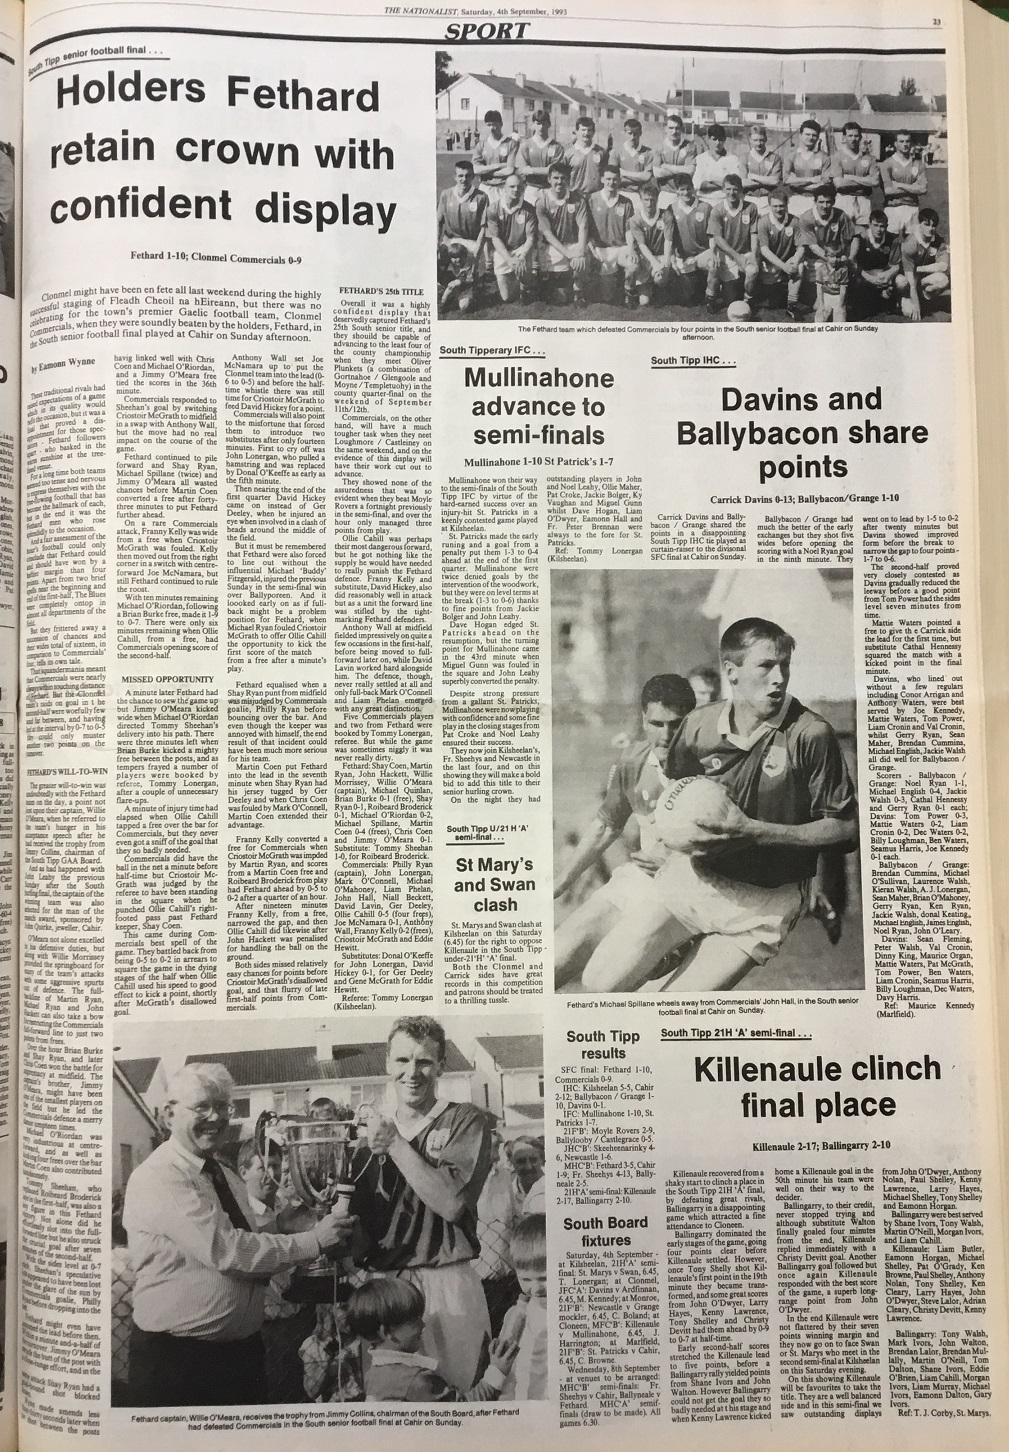 1993 South football final